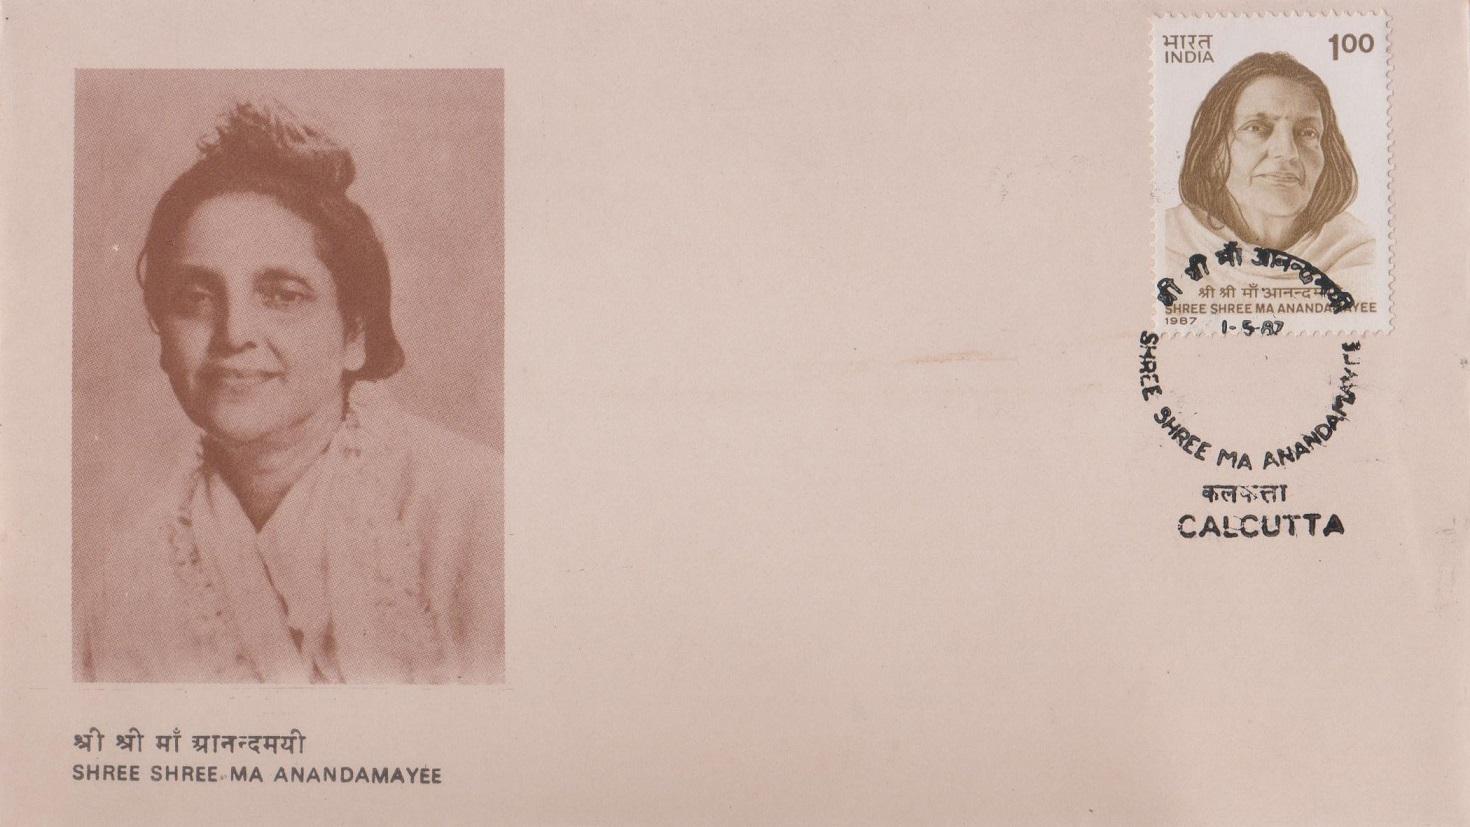 Anandamayi Ma (श्री माँ आनंदमयी)